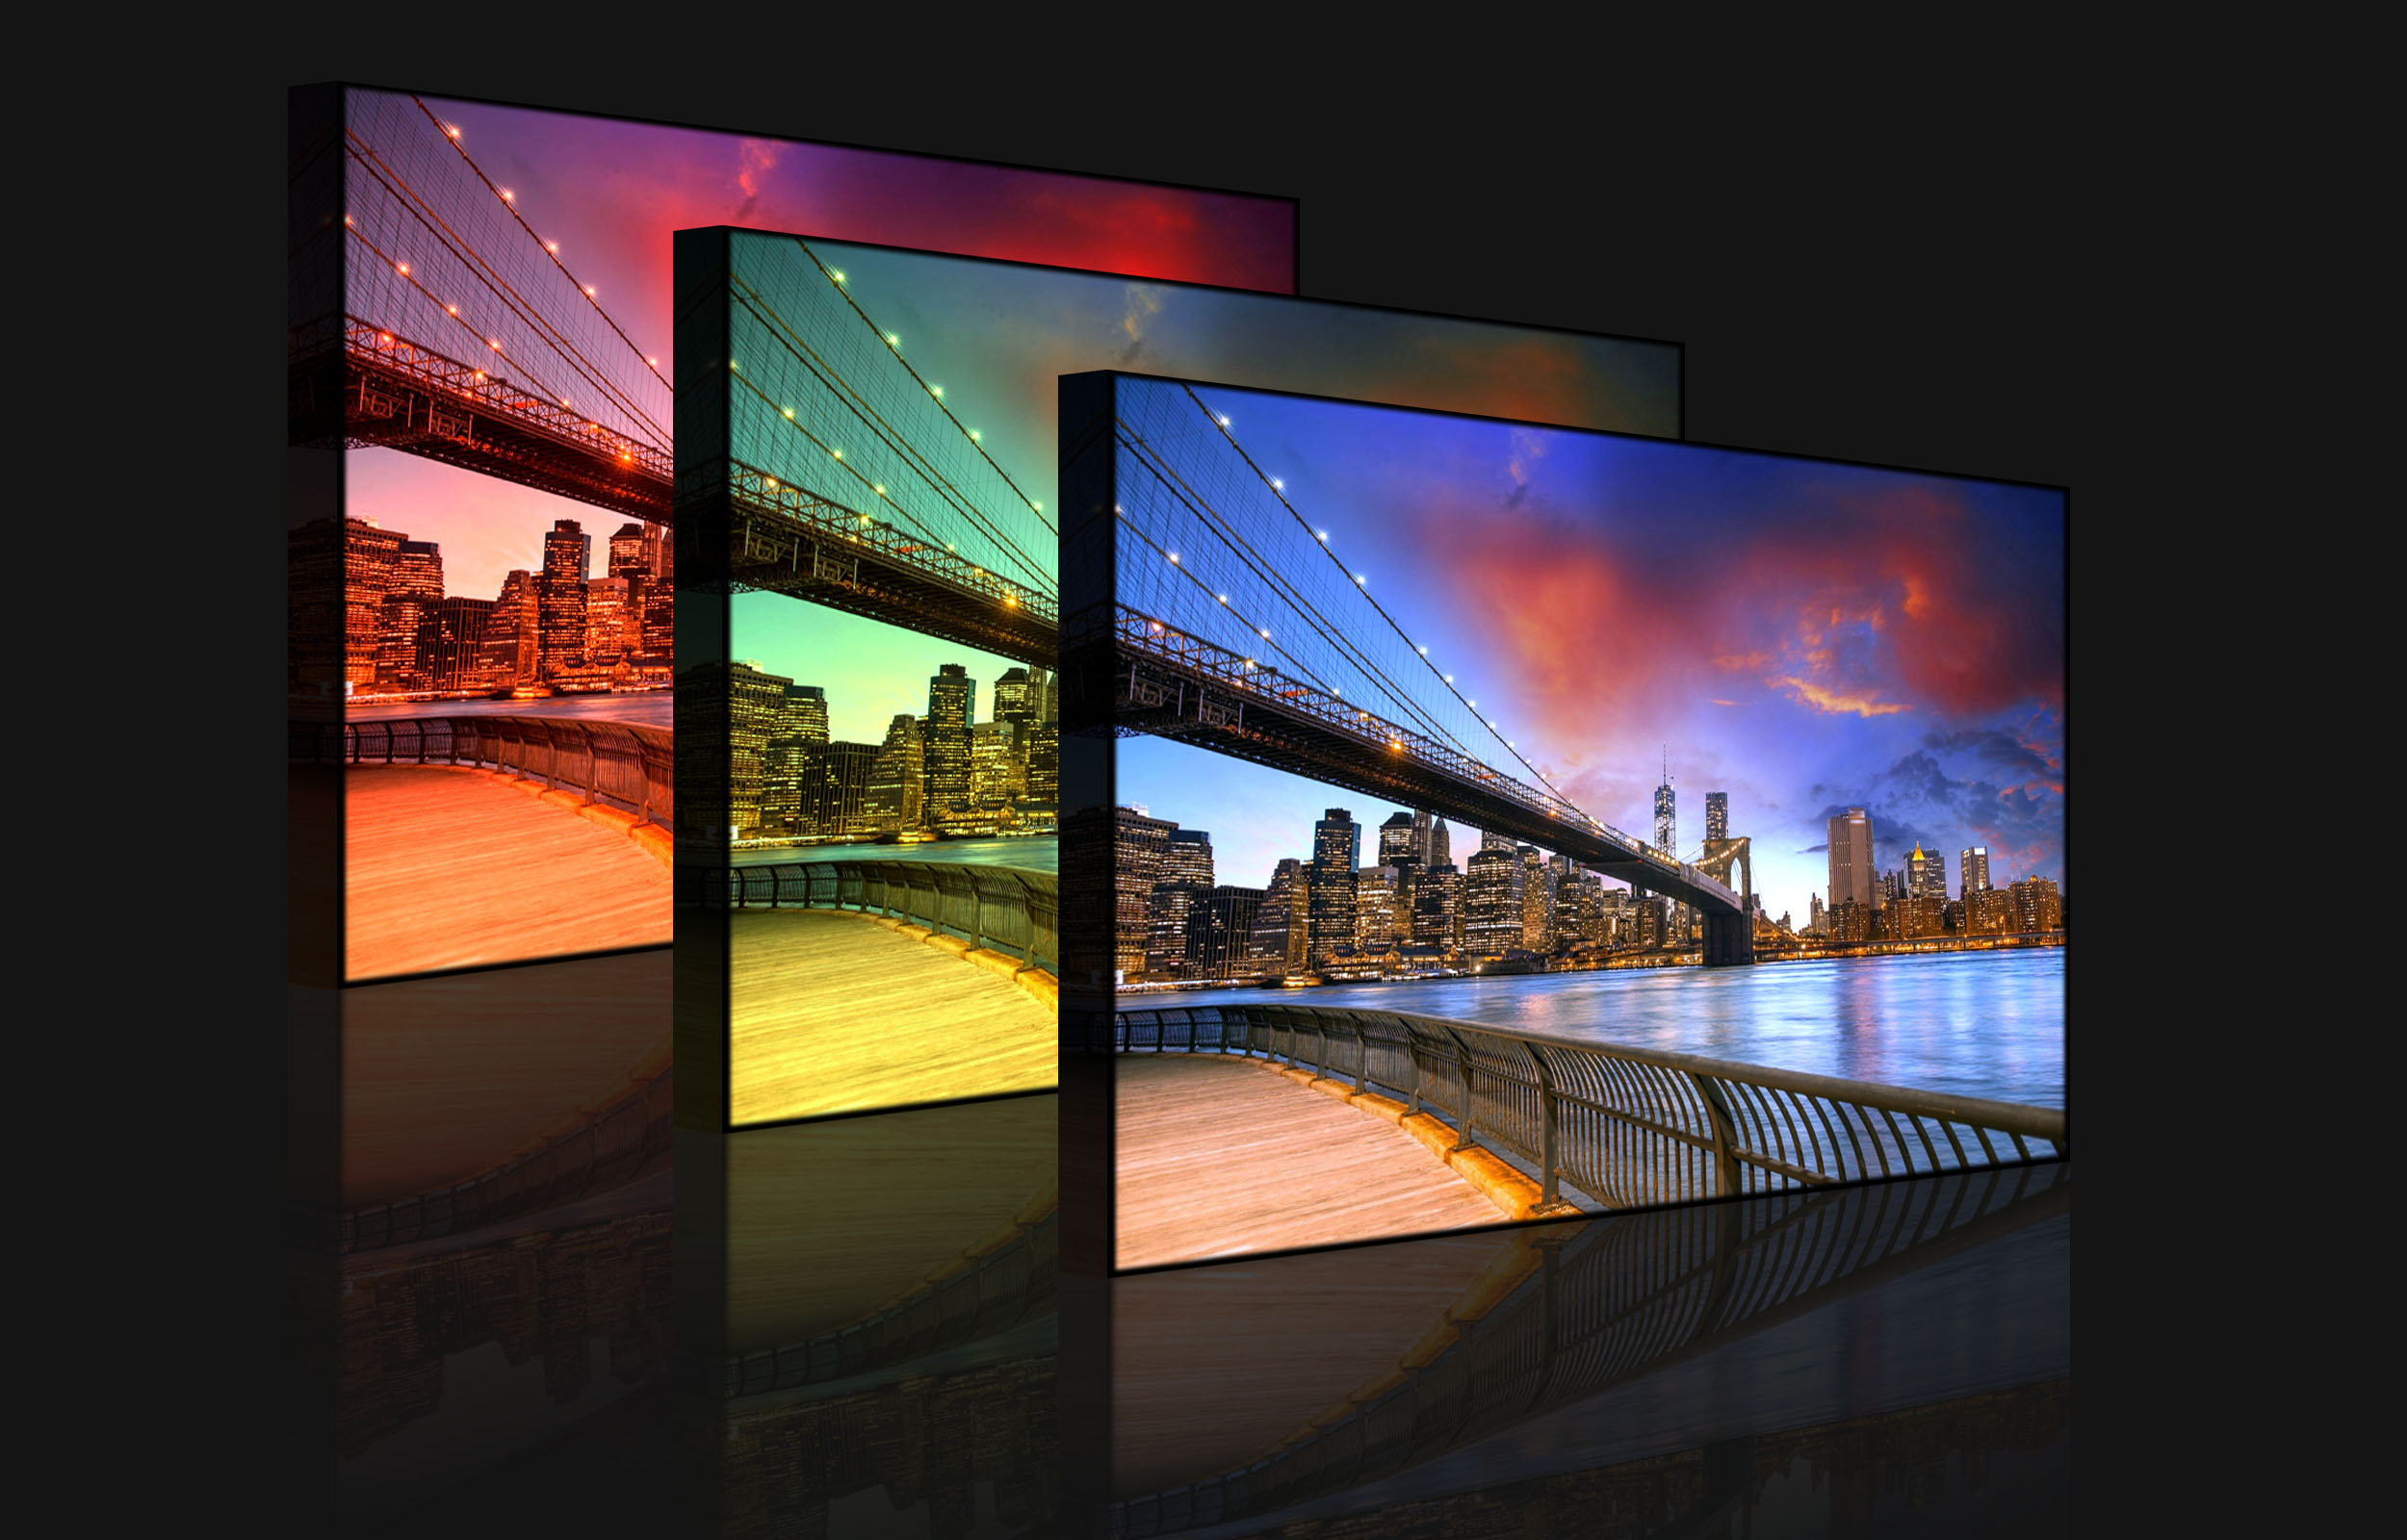 tableau illumin image led parc de brooklyn bridge new york front lighted ebay. Black Bedroom Furniture Sets. Home Design Ideas